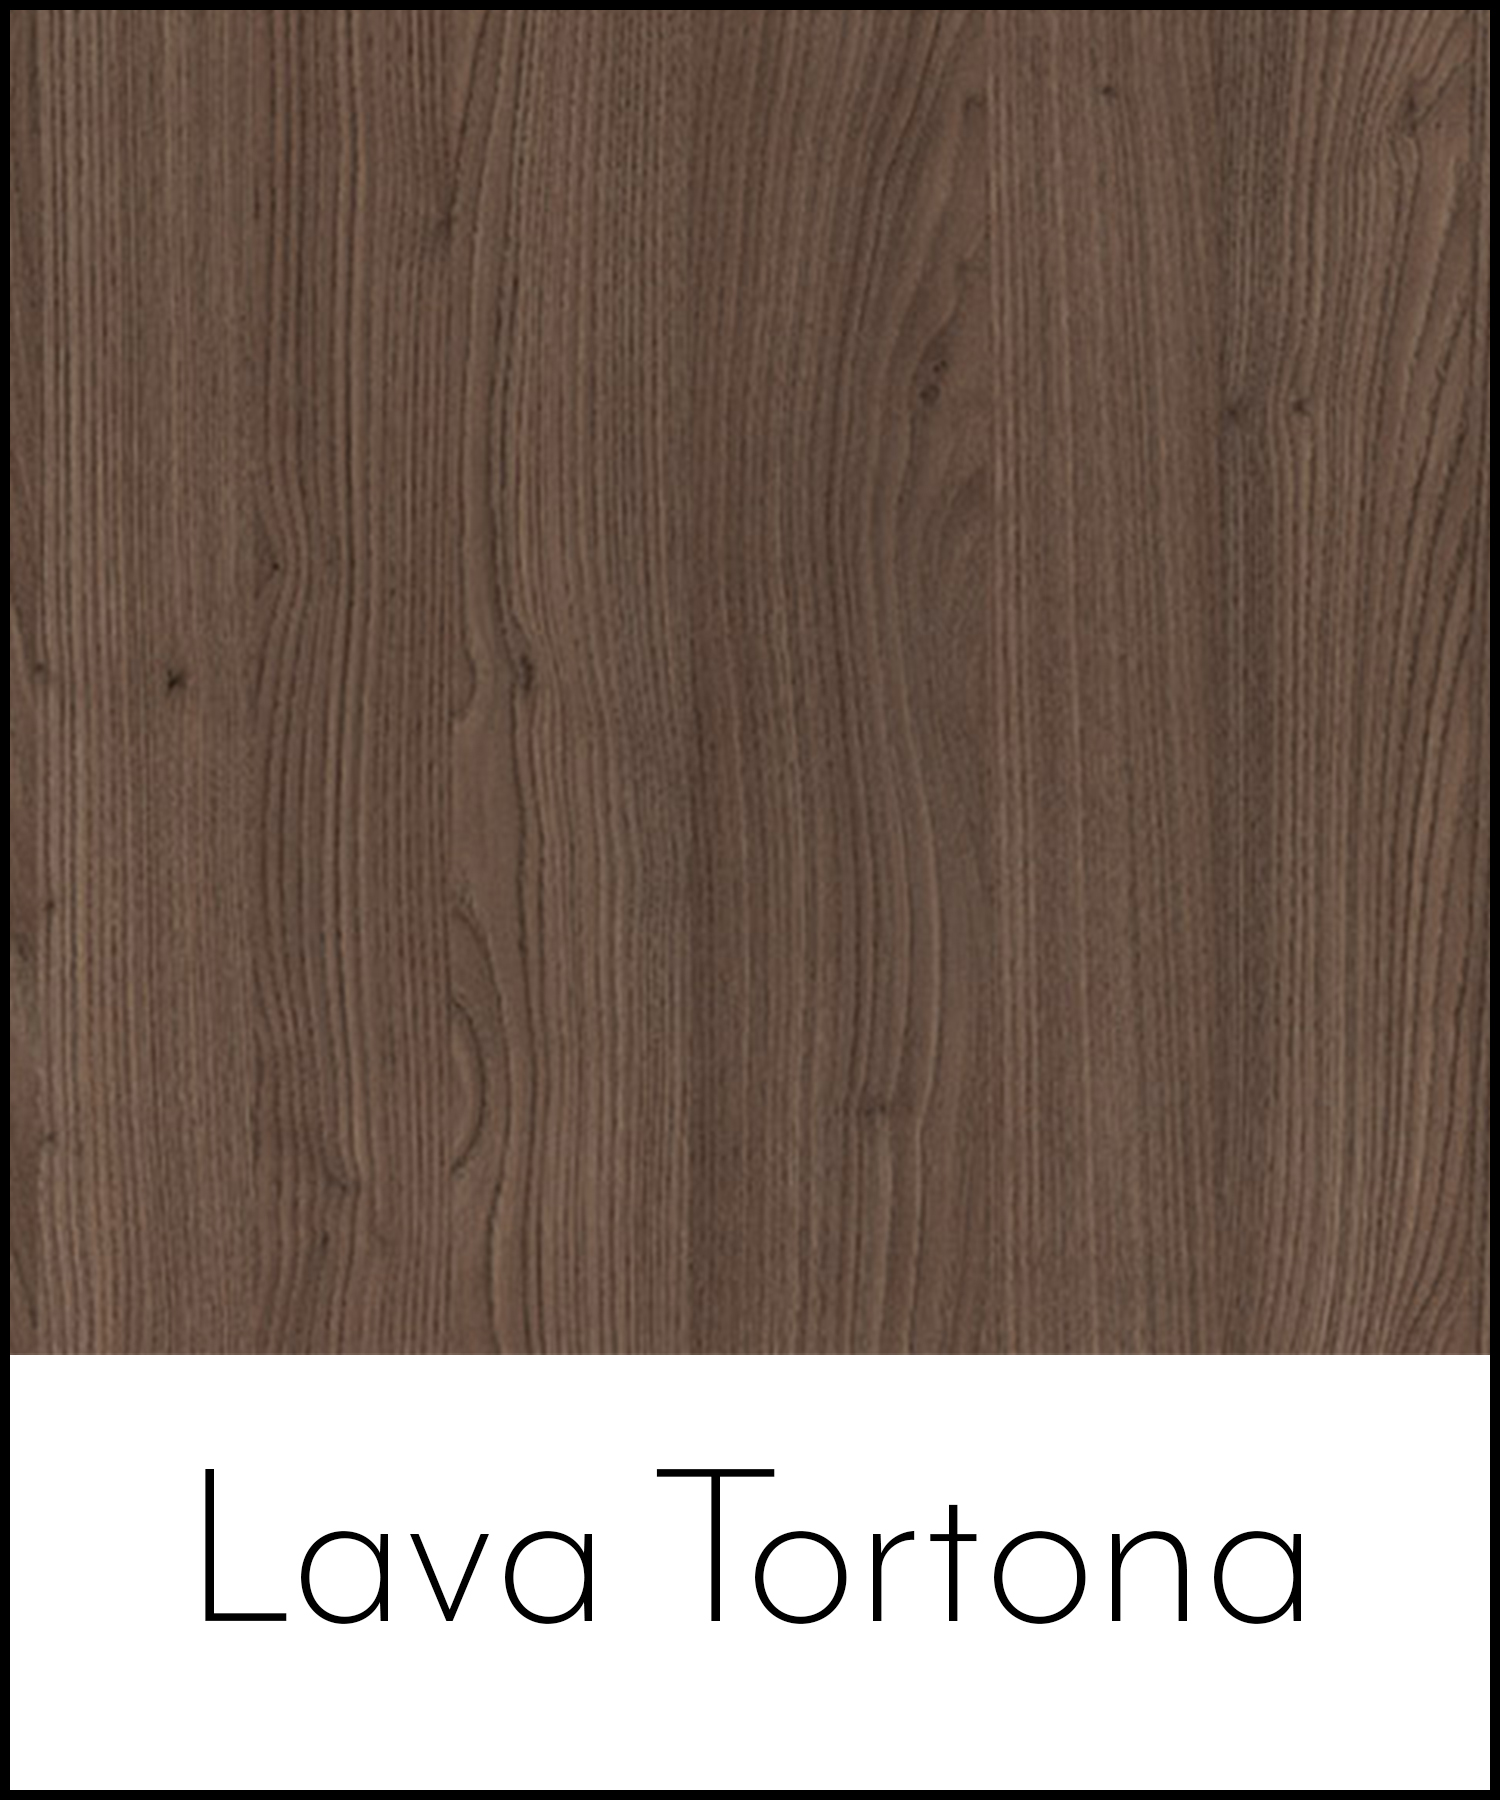 Lava Tortona.jpg